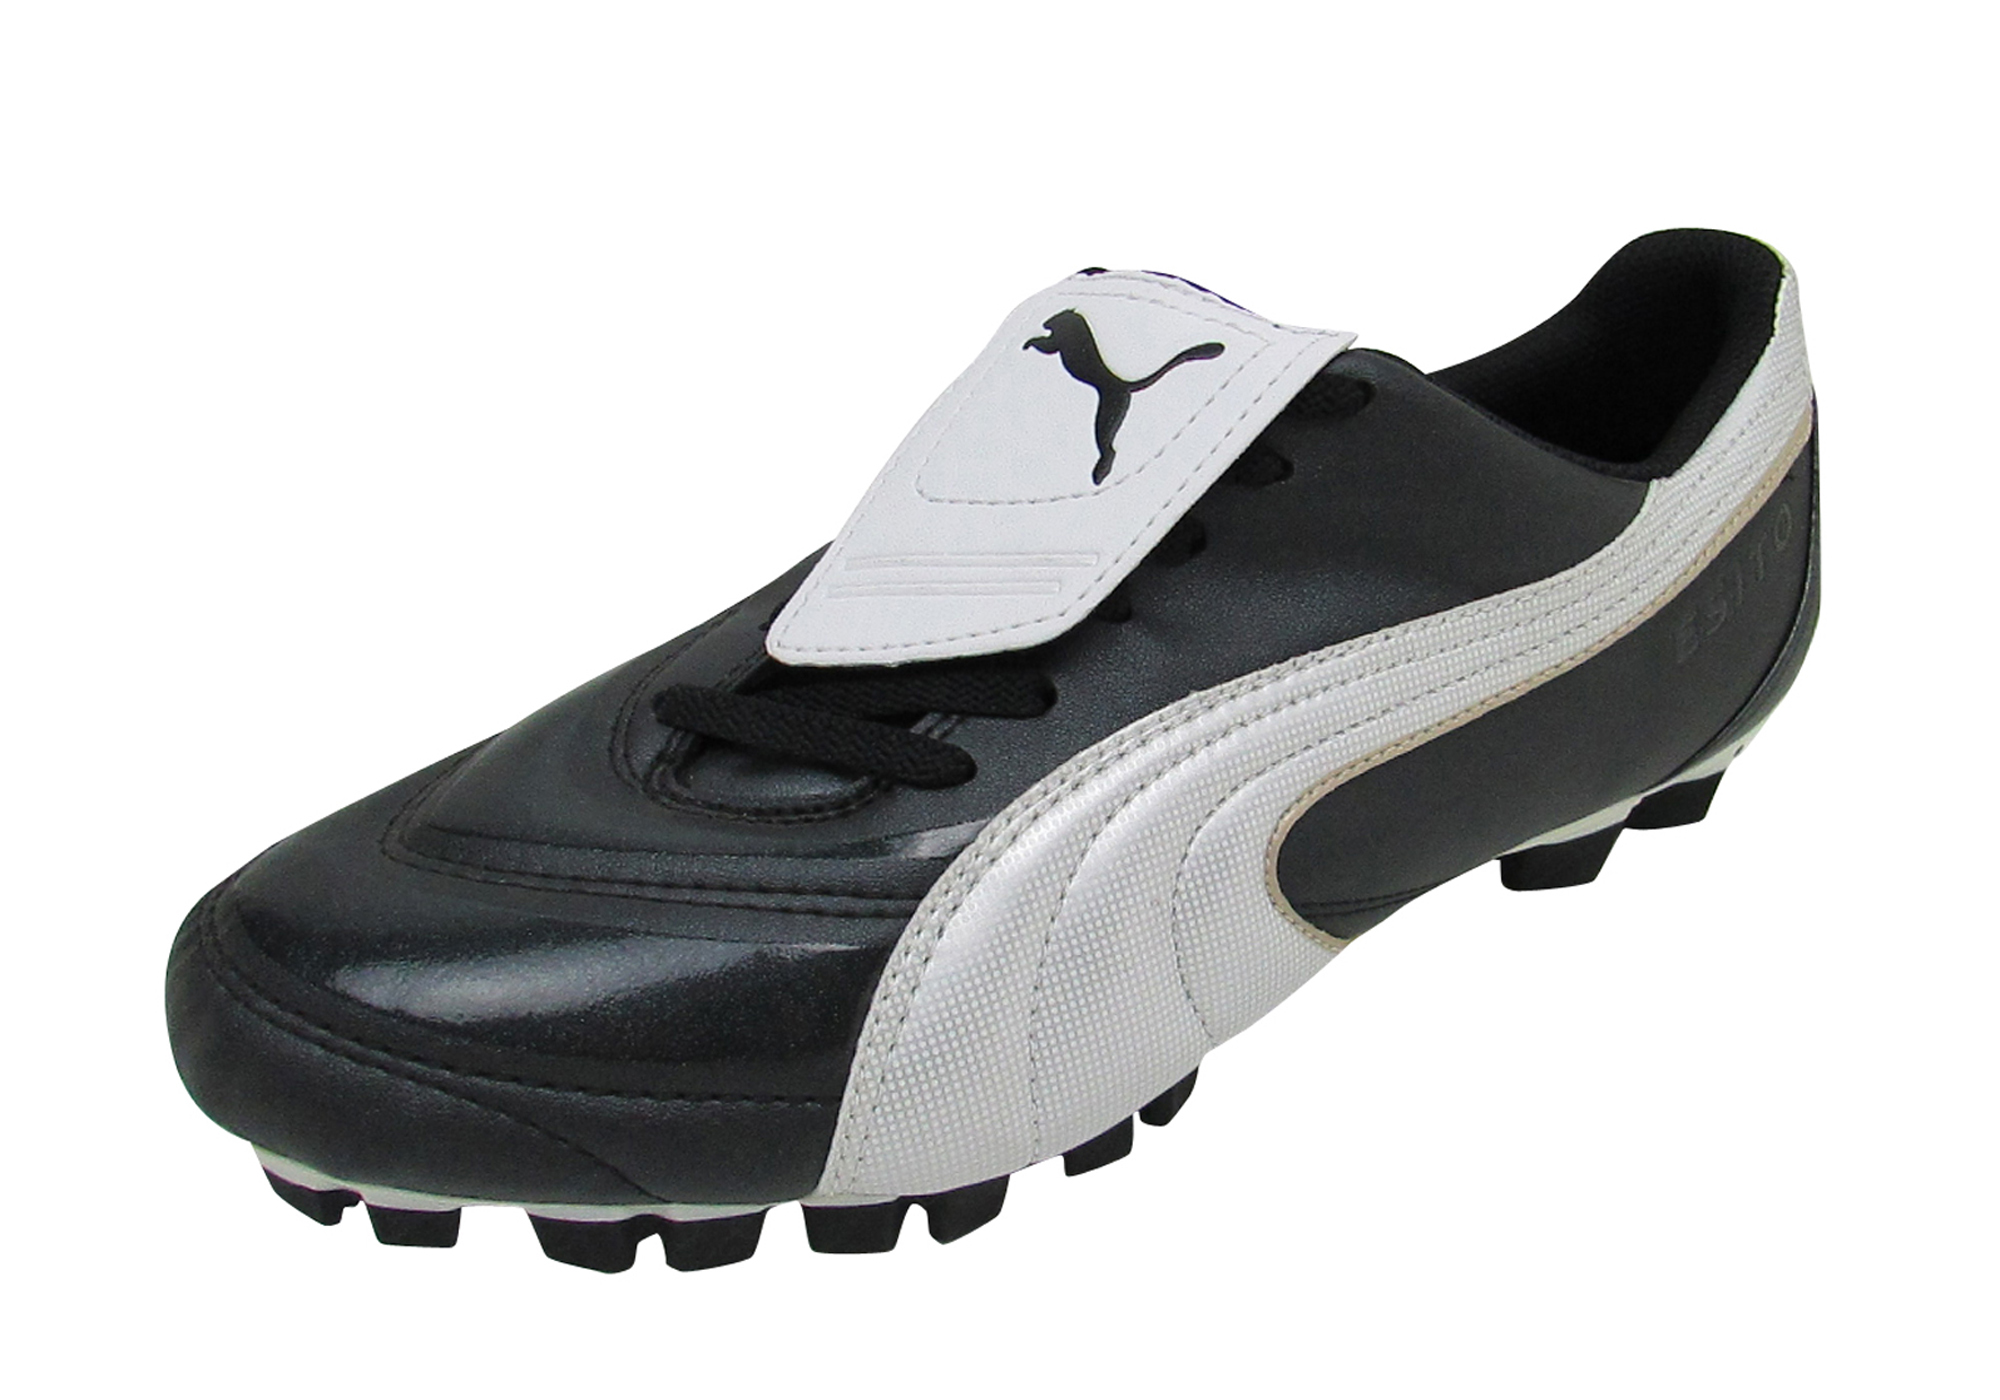 Mens Puma V Kat Gci Fg Football Boots Firm Ground Soccer